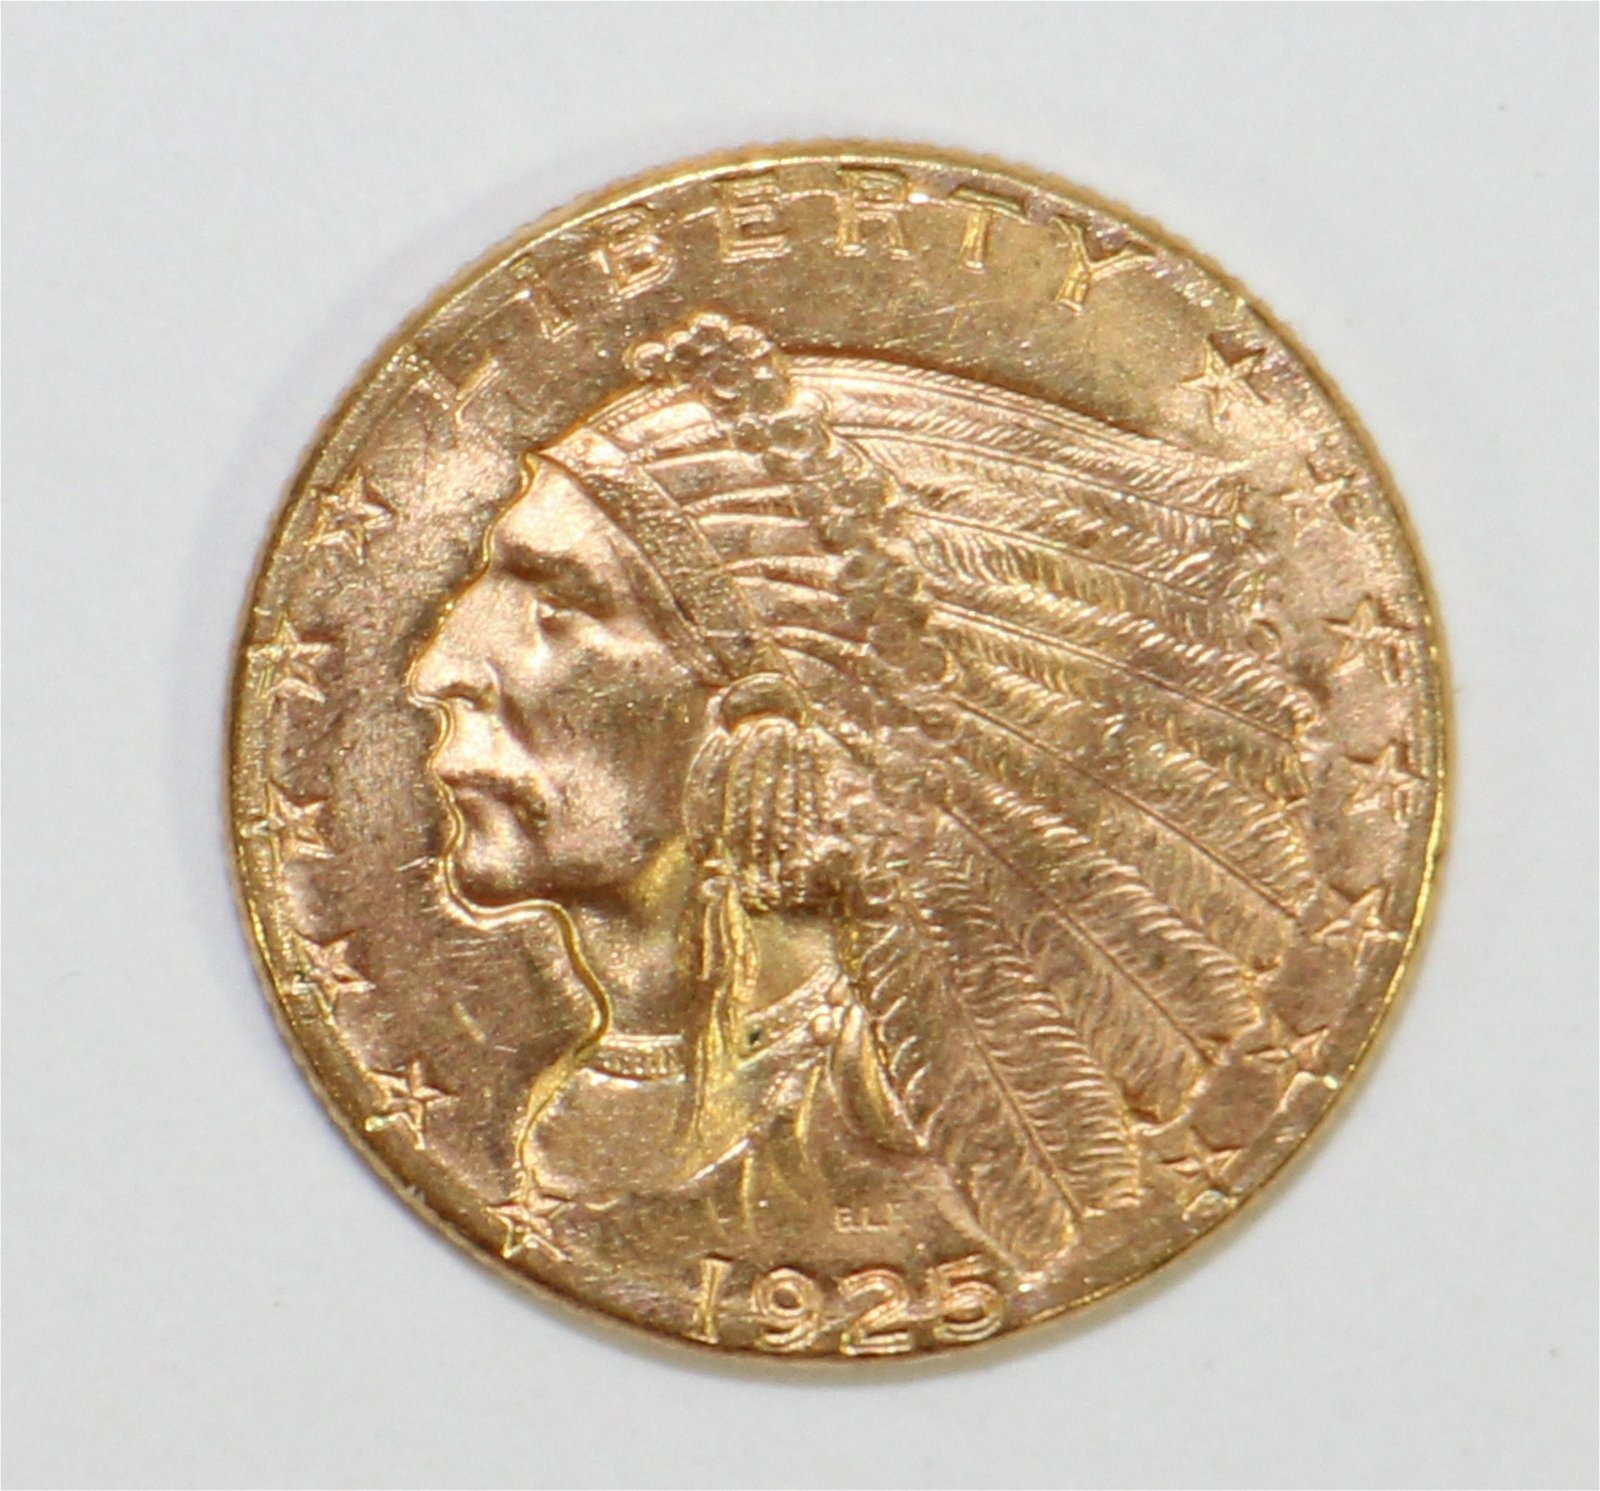 1925D $2.50 INDIAN GOLD COIN